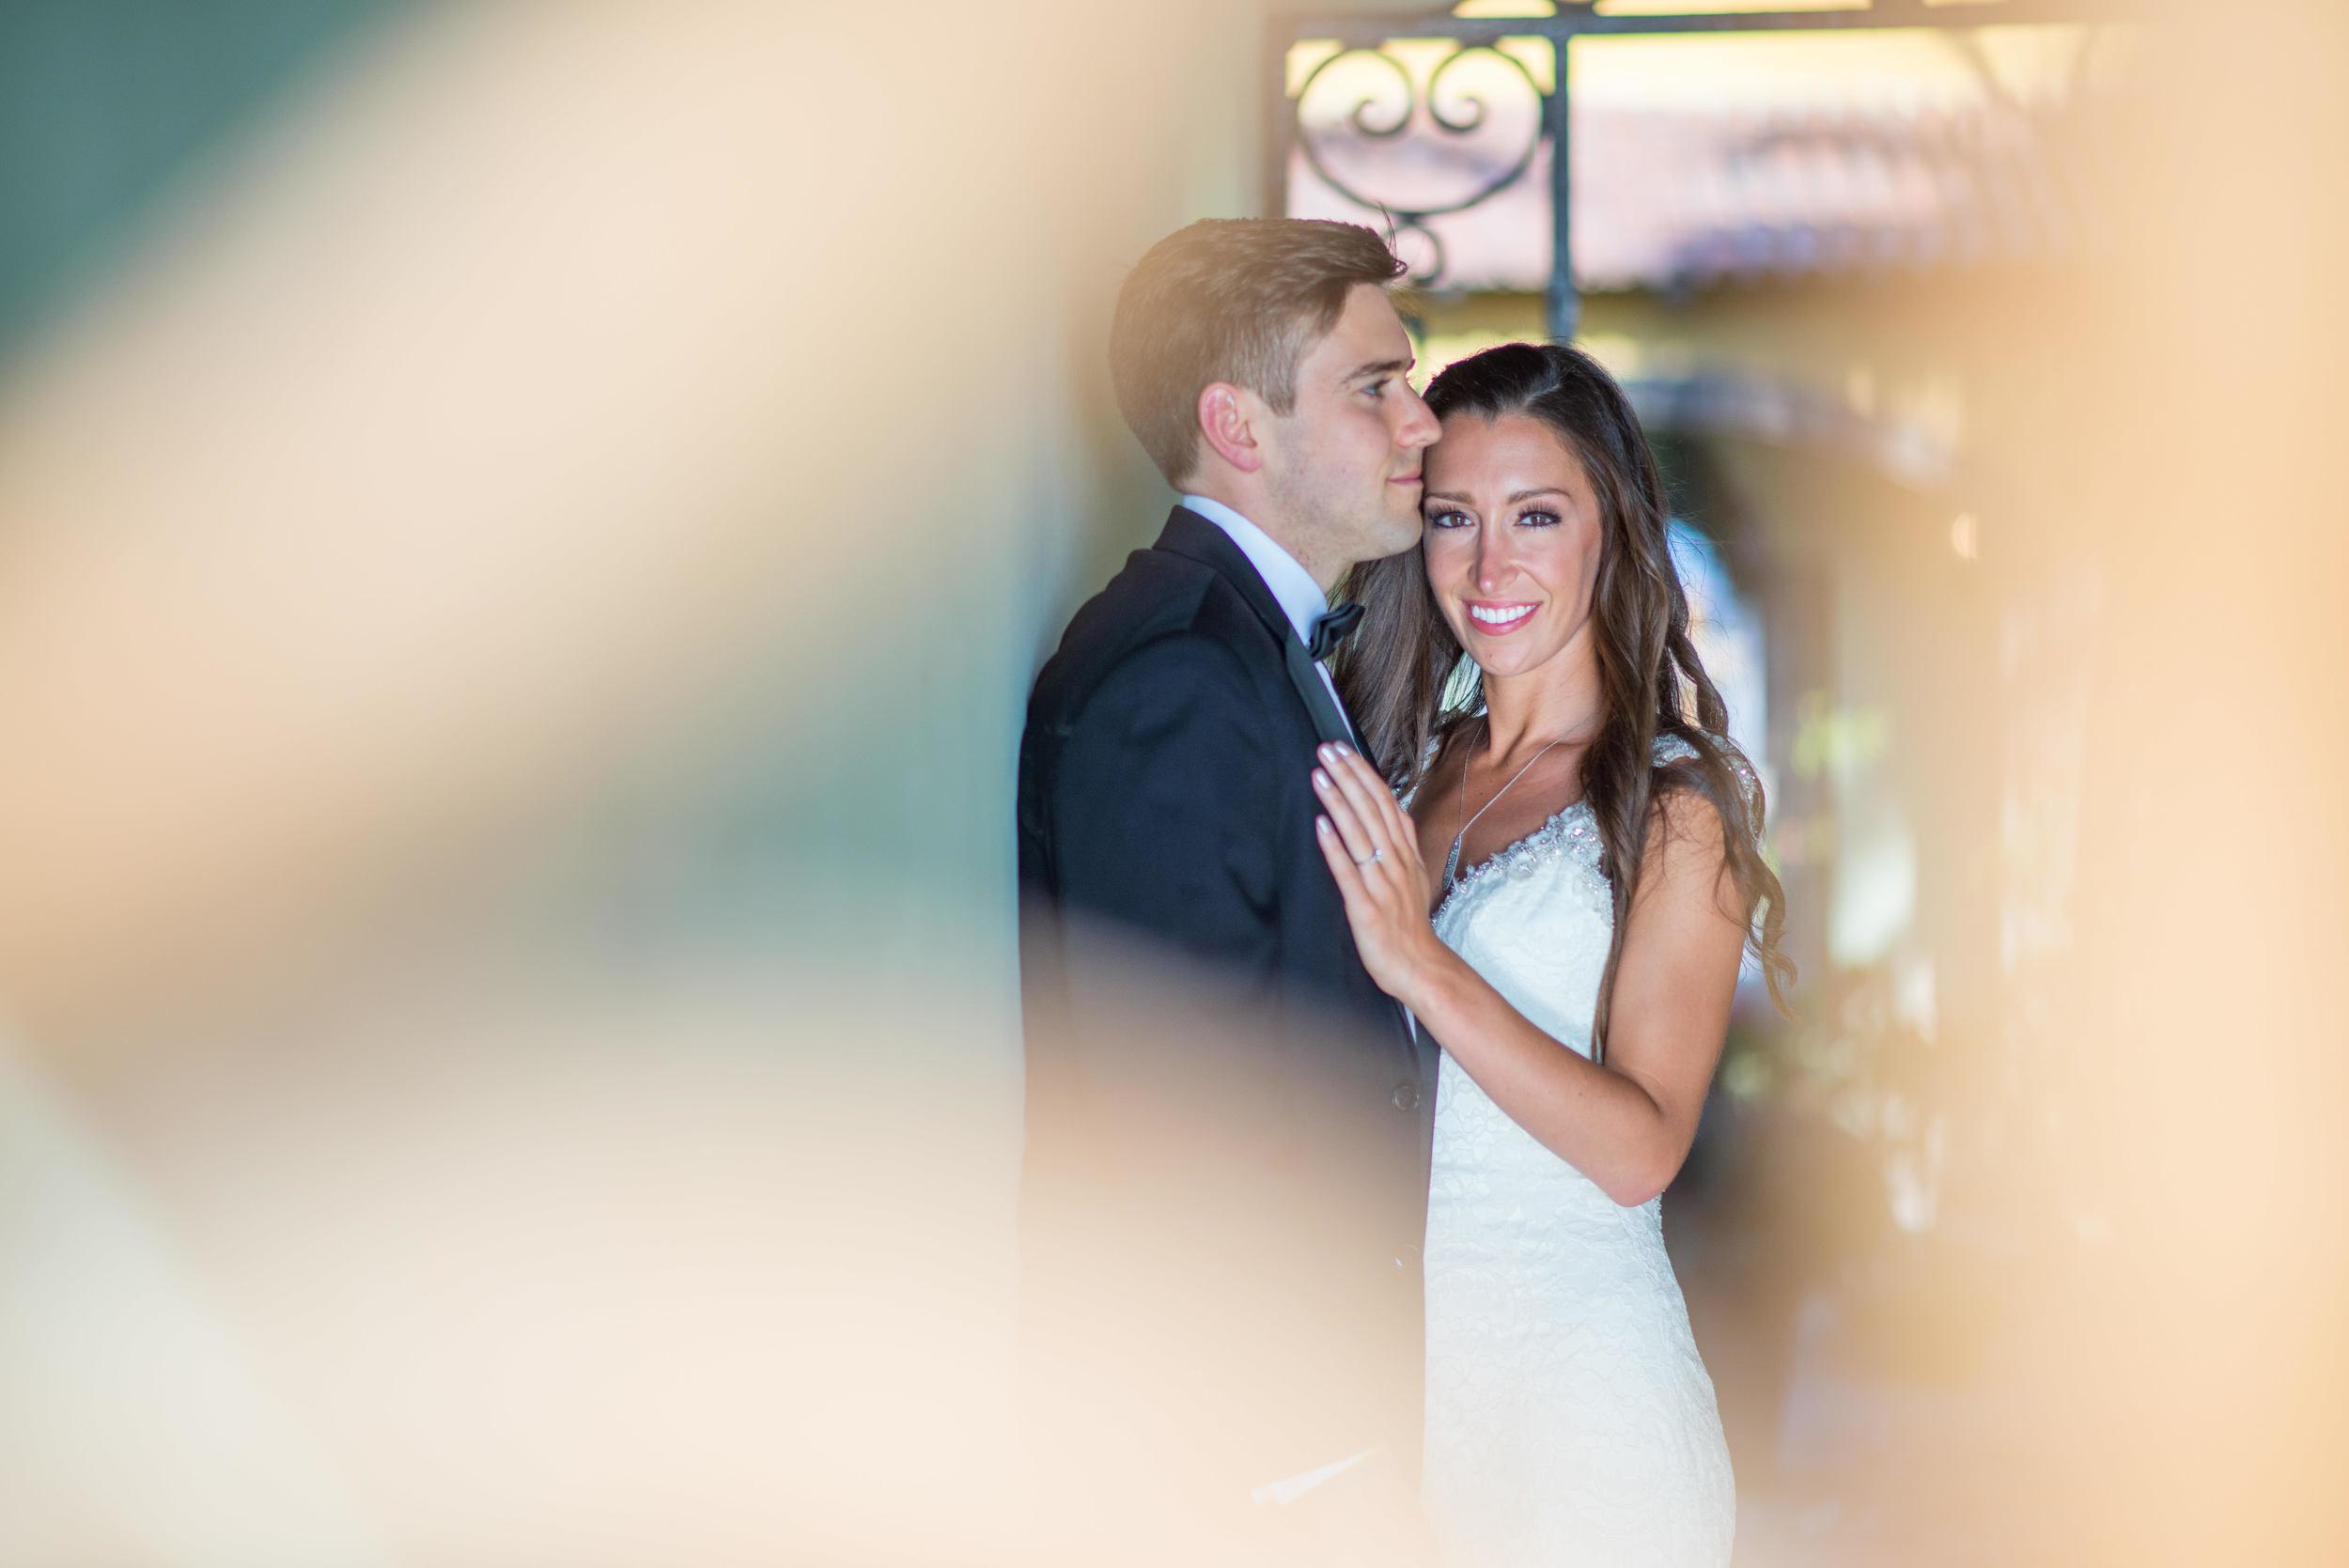 Our wedding day-41.JPG